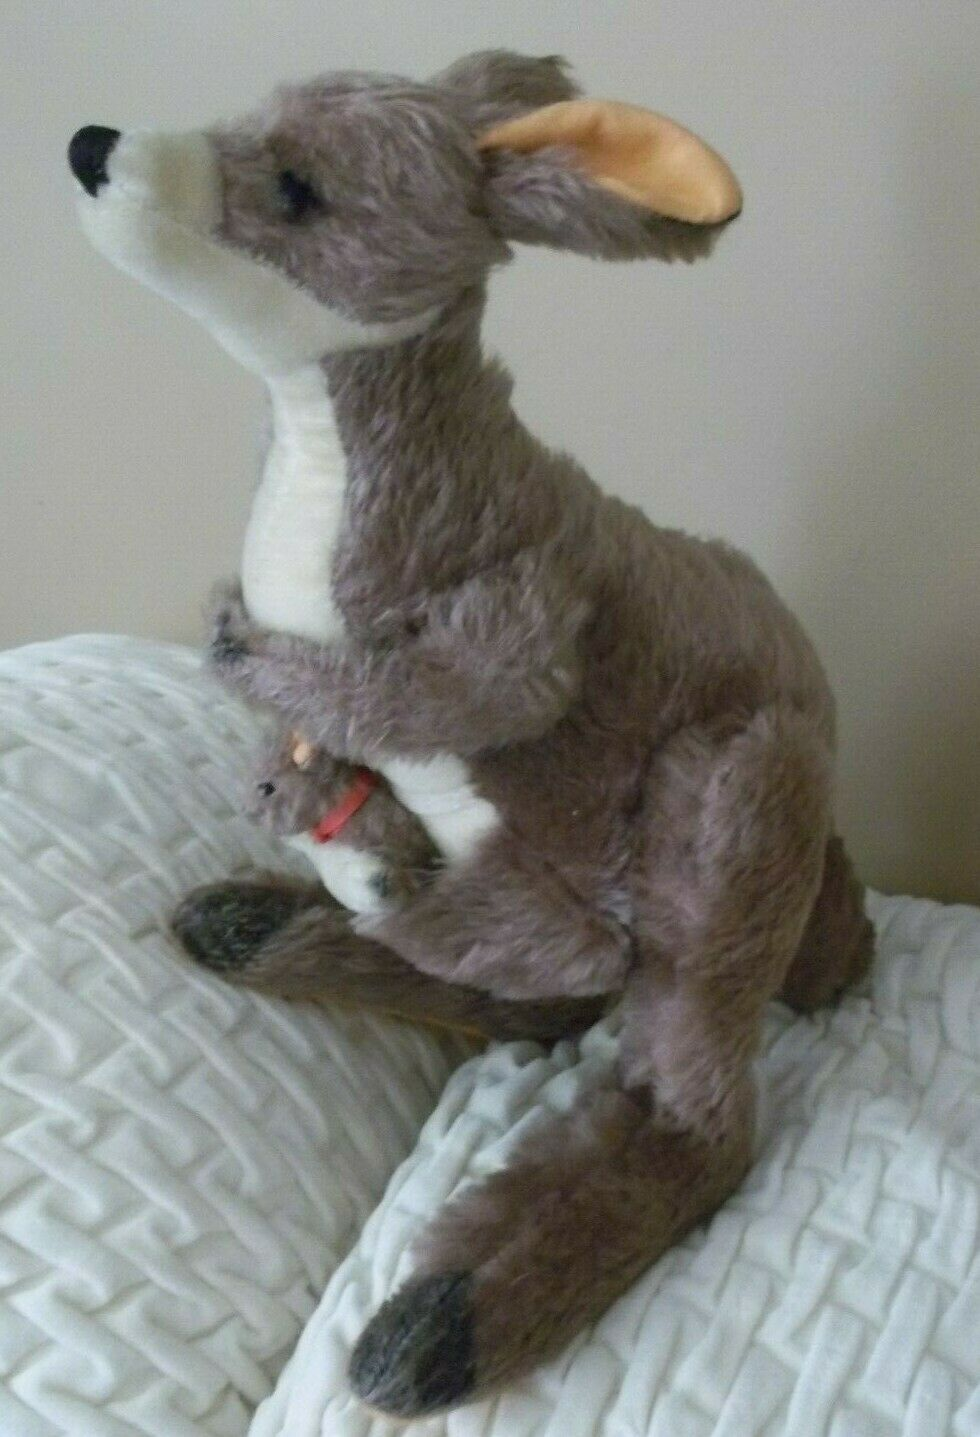 vtg MERRYTHOUGHT merry thought KANGAROO w/ Baby joey stuffed plush TOY england